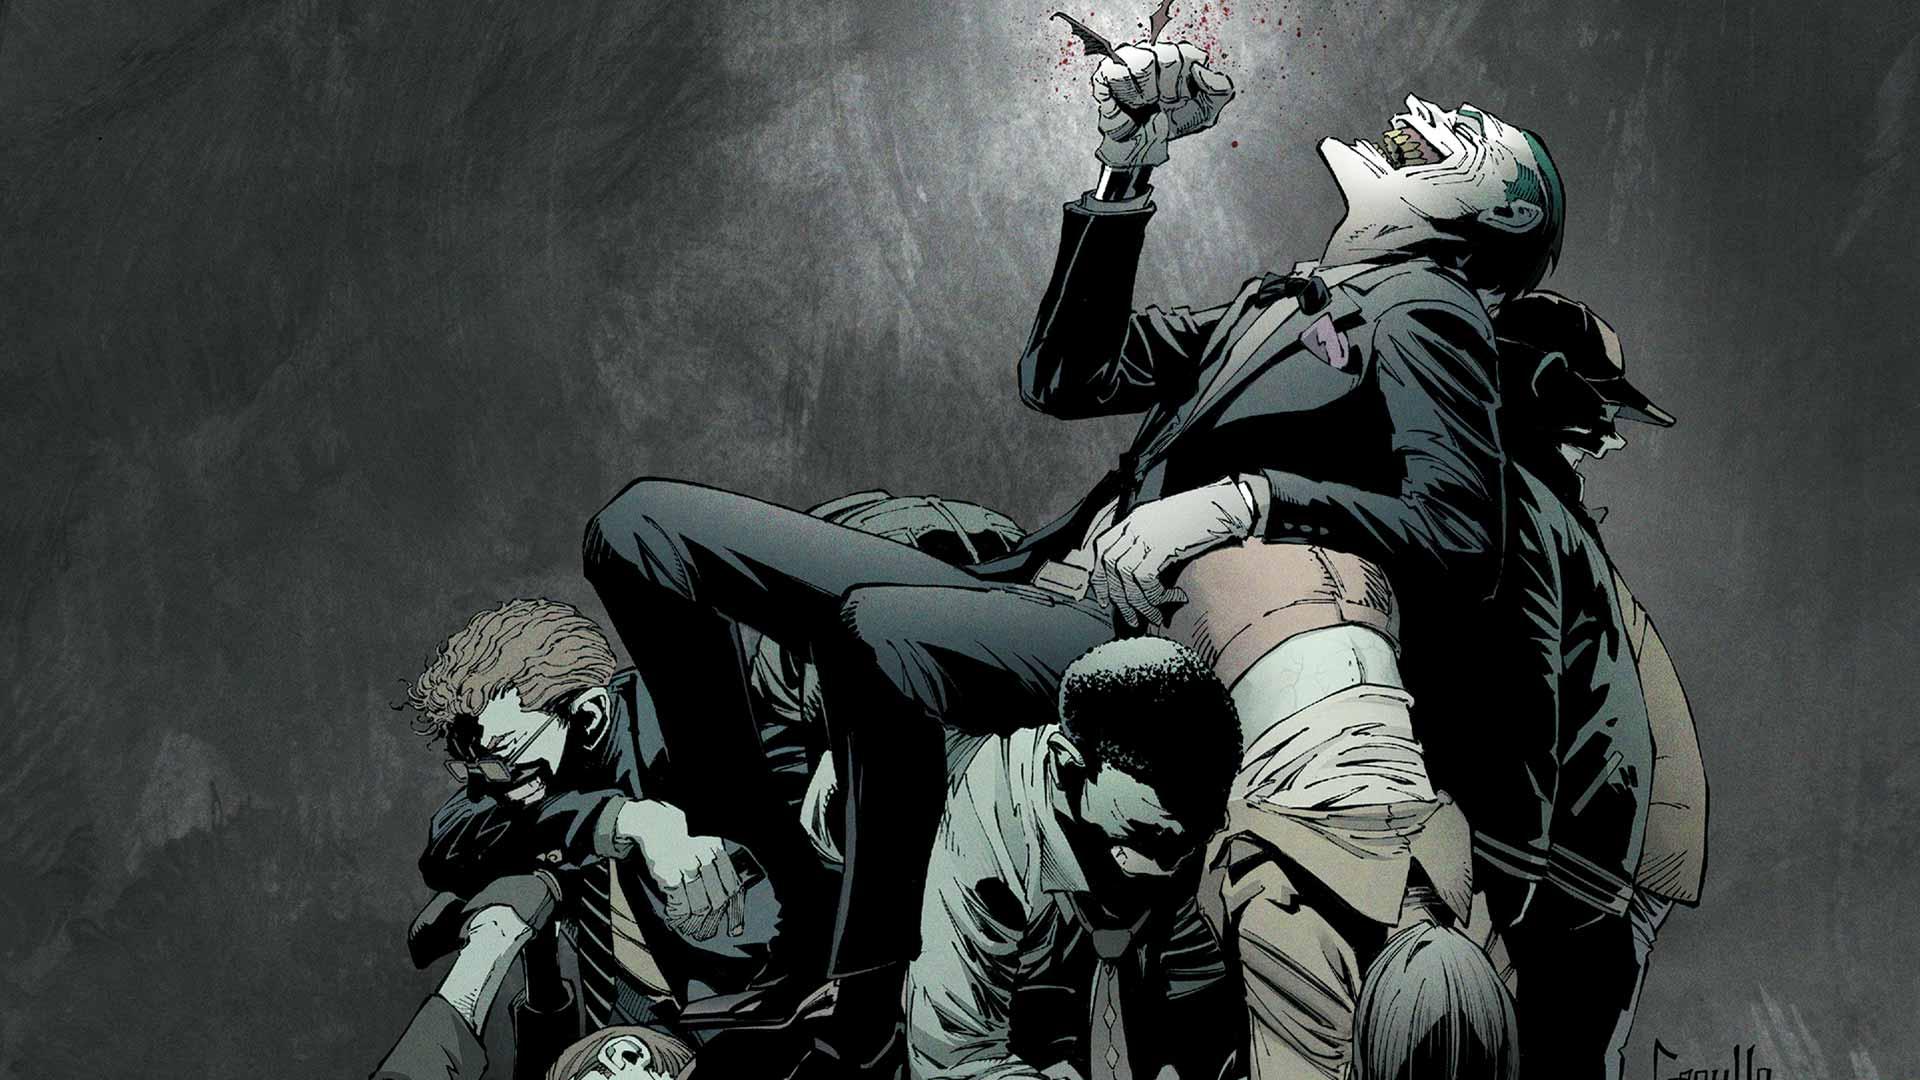 1920x1080 Px Artwork Batman Comics DC Fantasy Art Joker